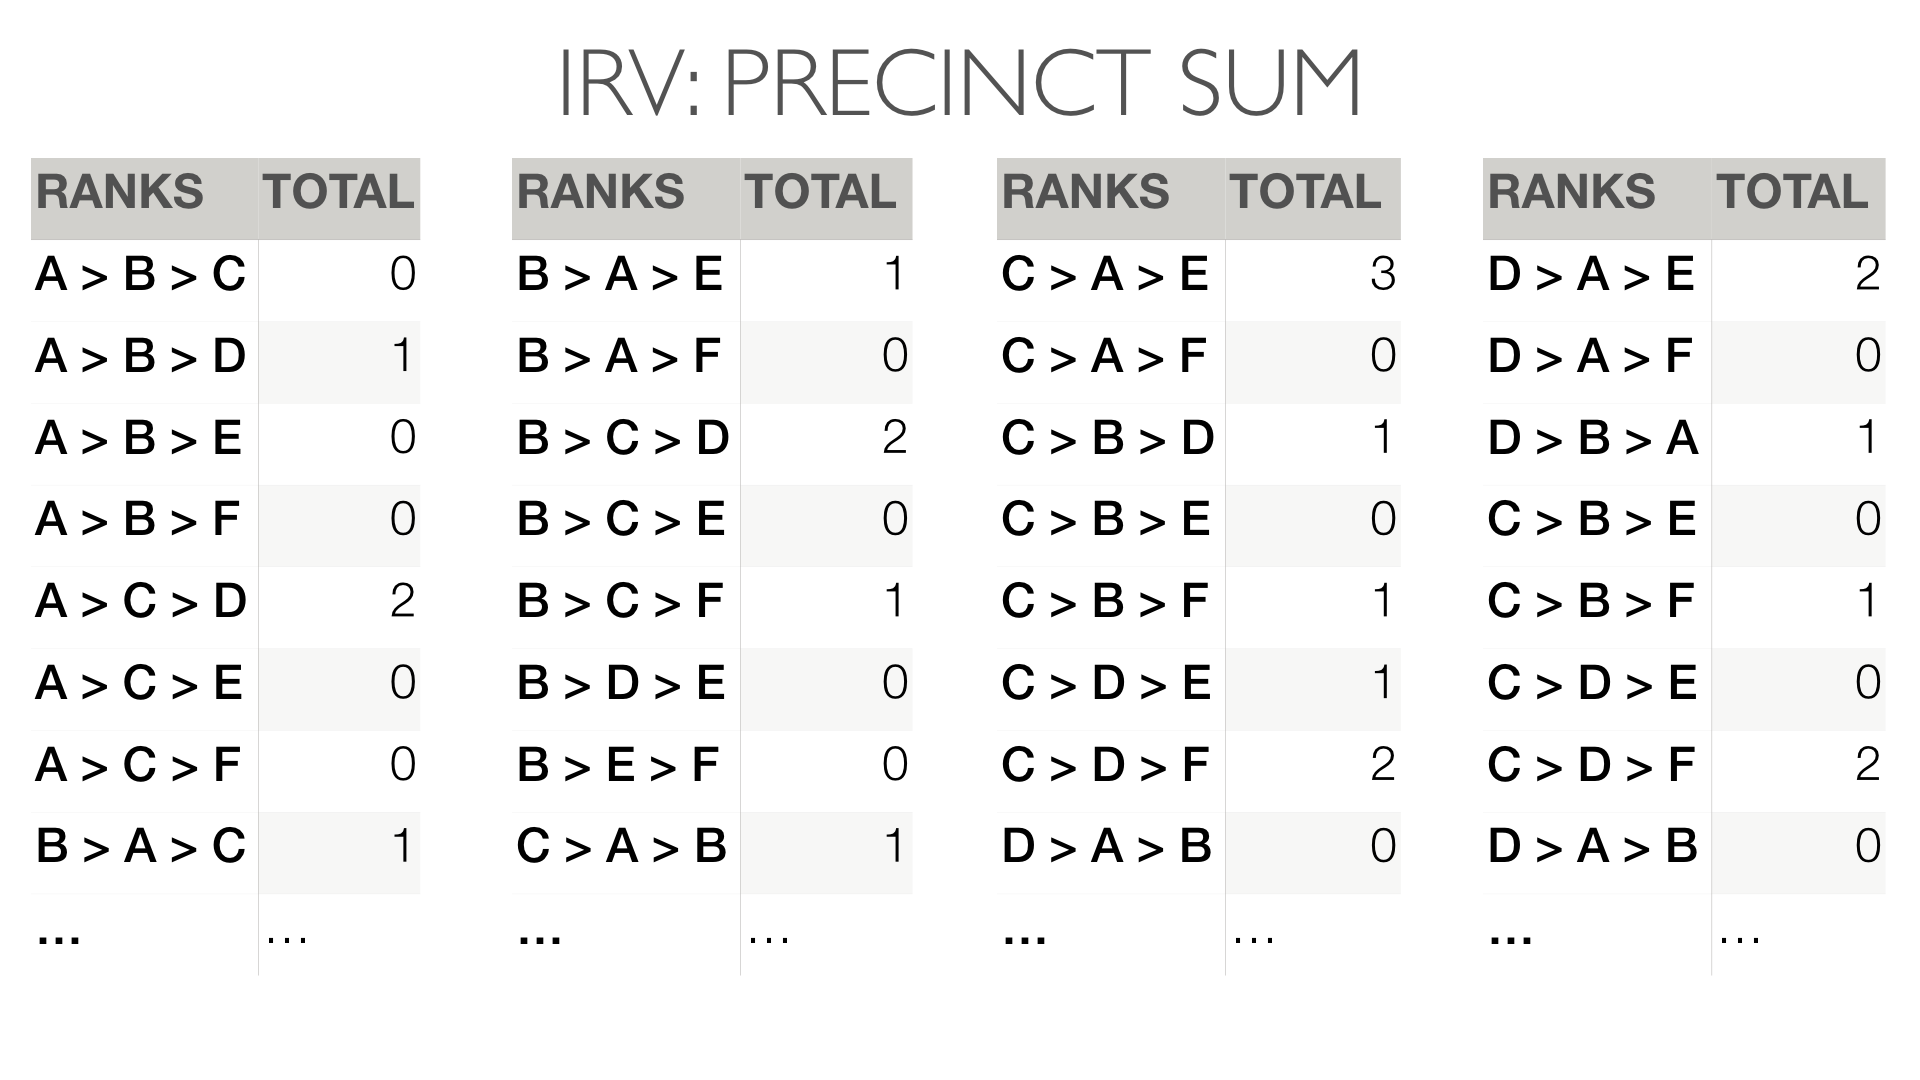 IRV_precinct.png